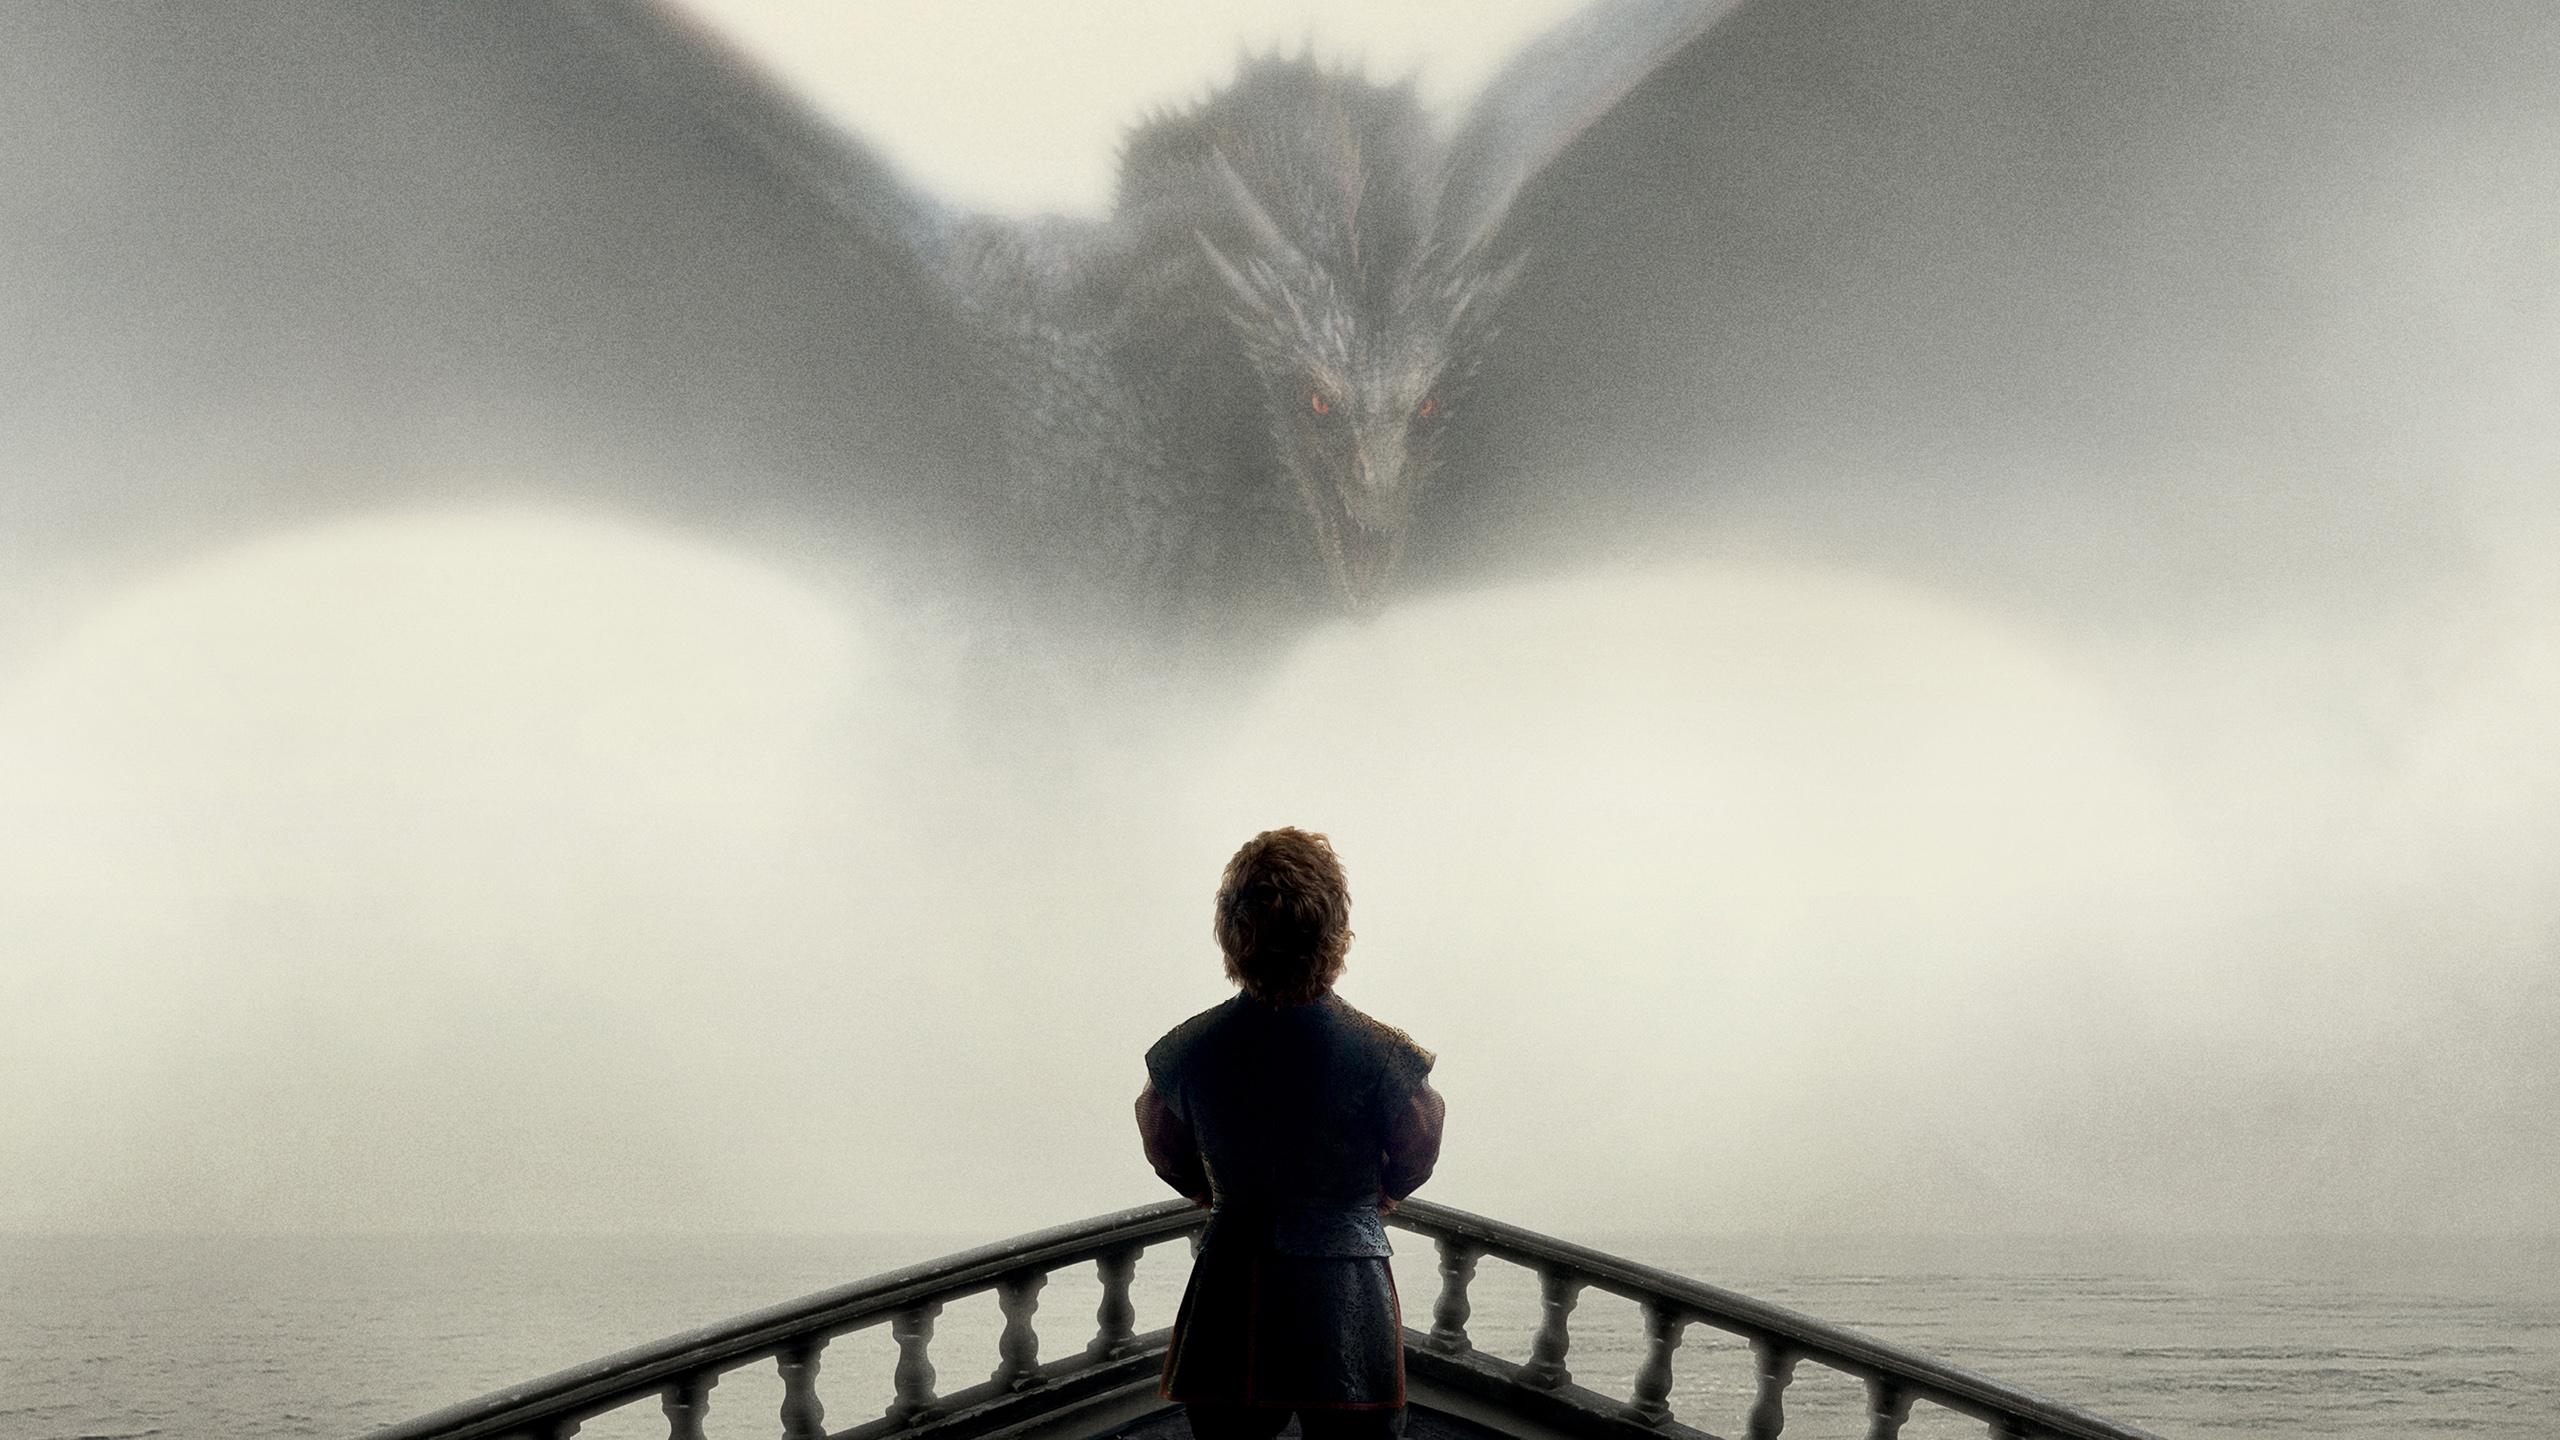 Download Gratis Game Of Thrones Season 7